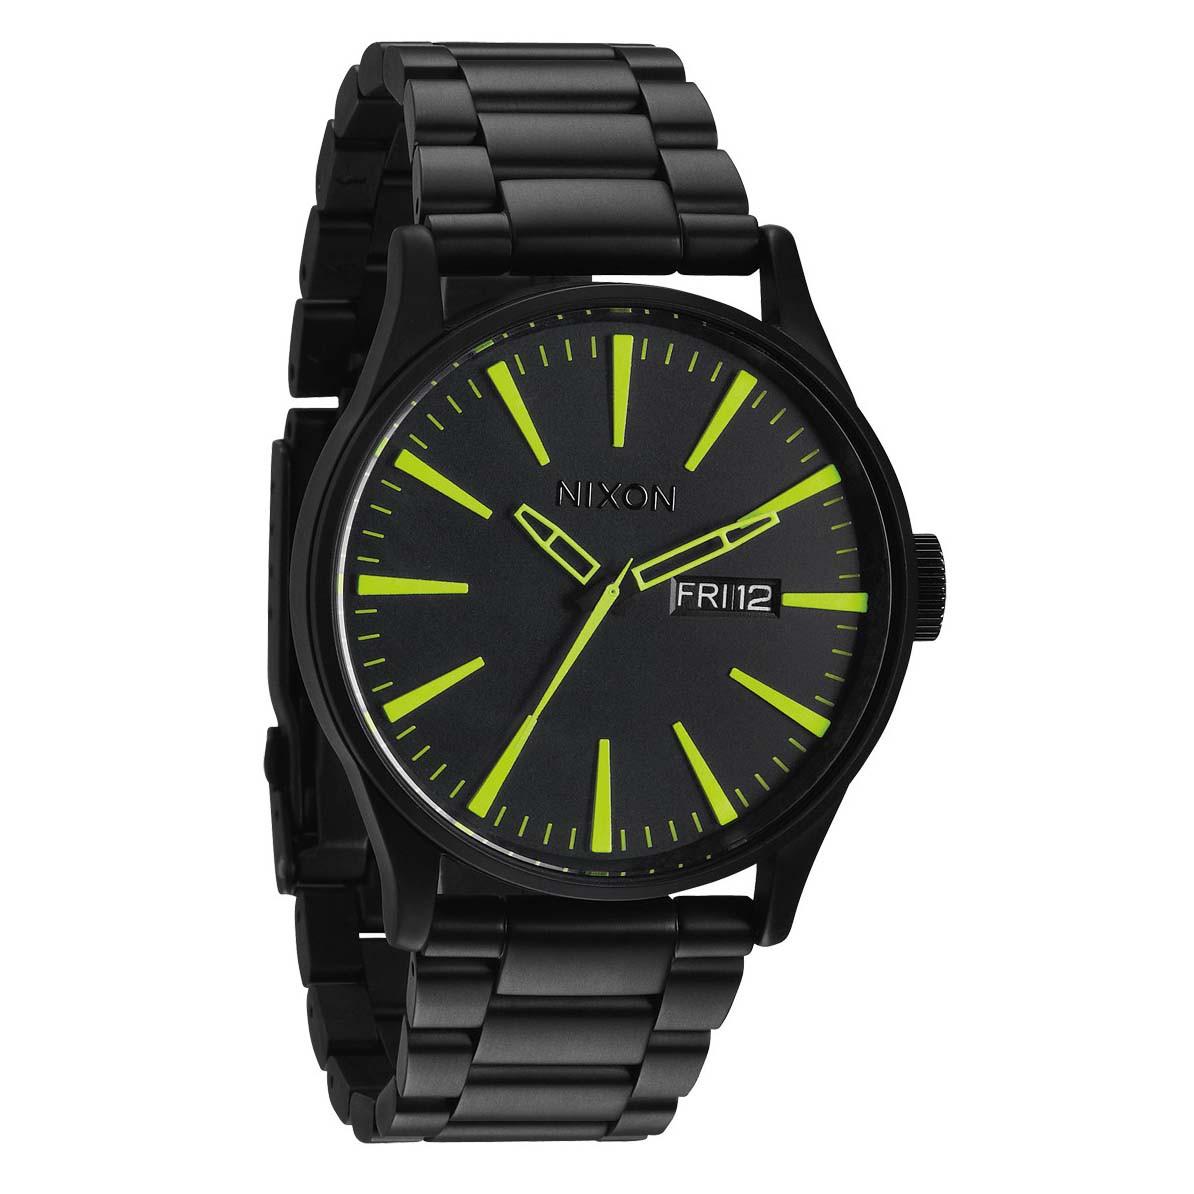 Купить часы Nixon - AdventikaWatch